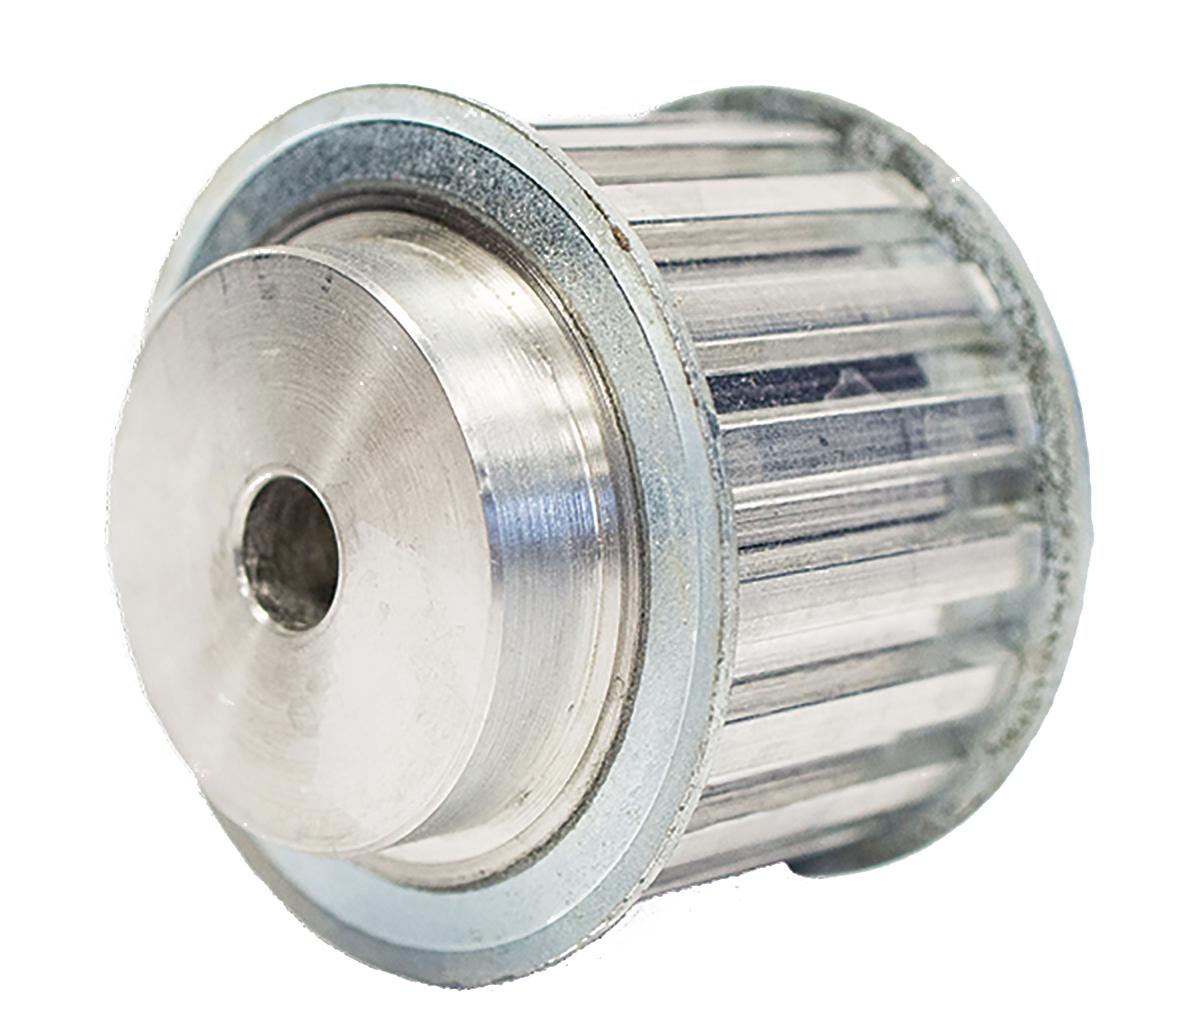 47T10/30-2 - Aluminum Metric Pulleys